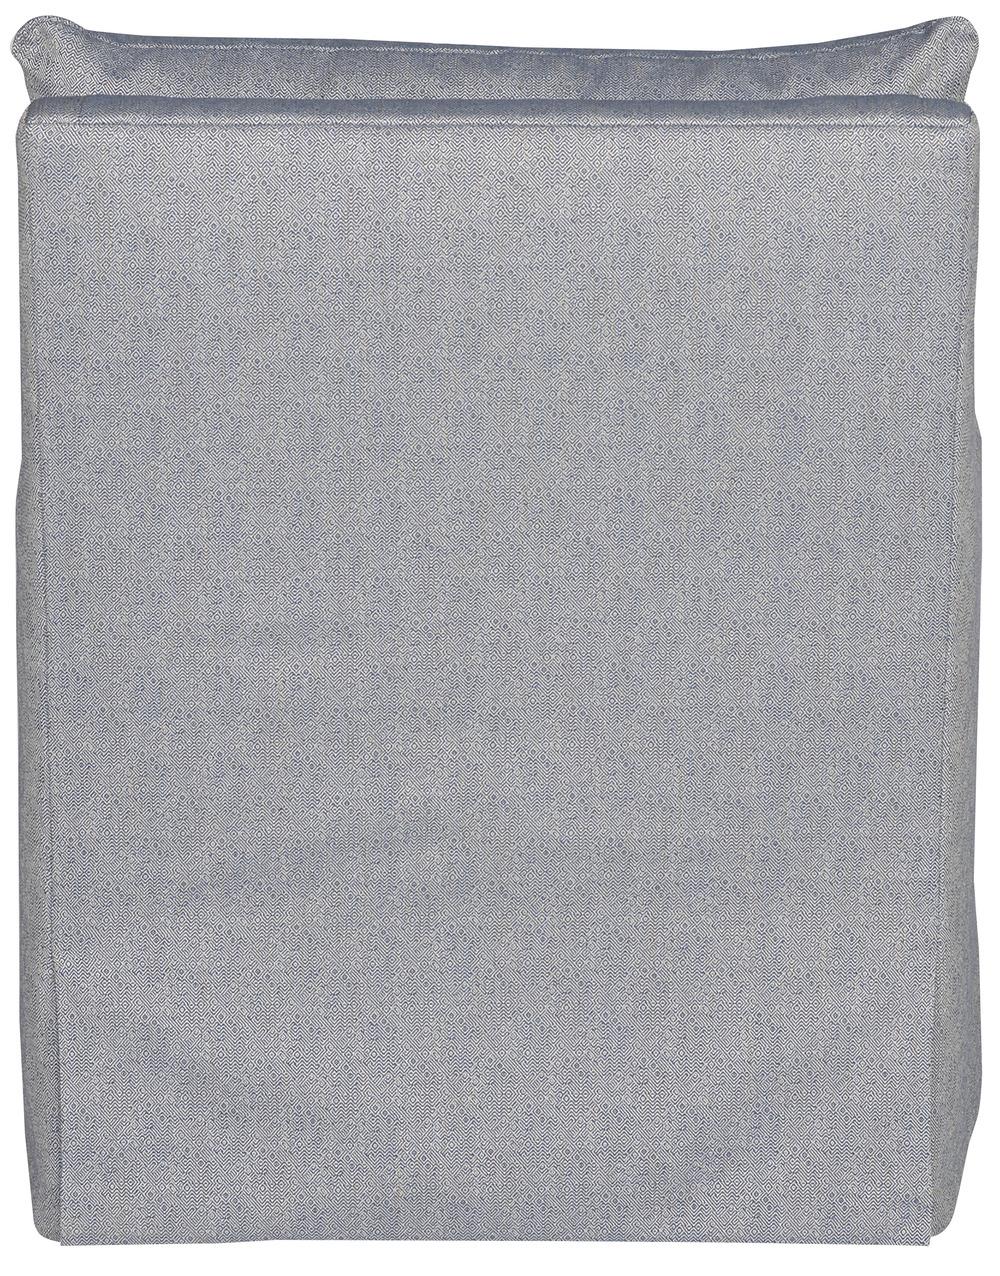 Vanguard Furniture - Plain Waterfall Skirt Swivel Chair